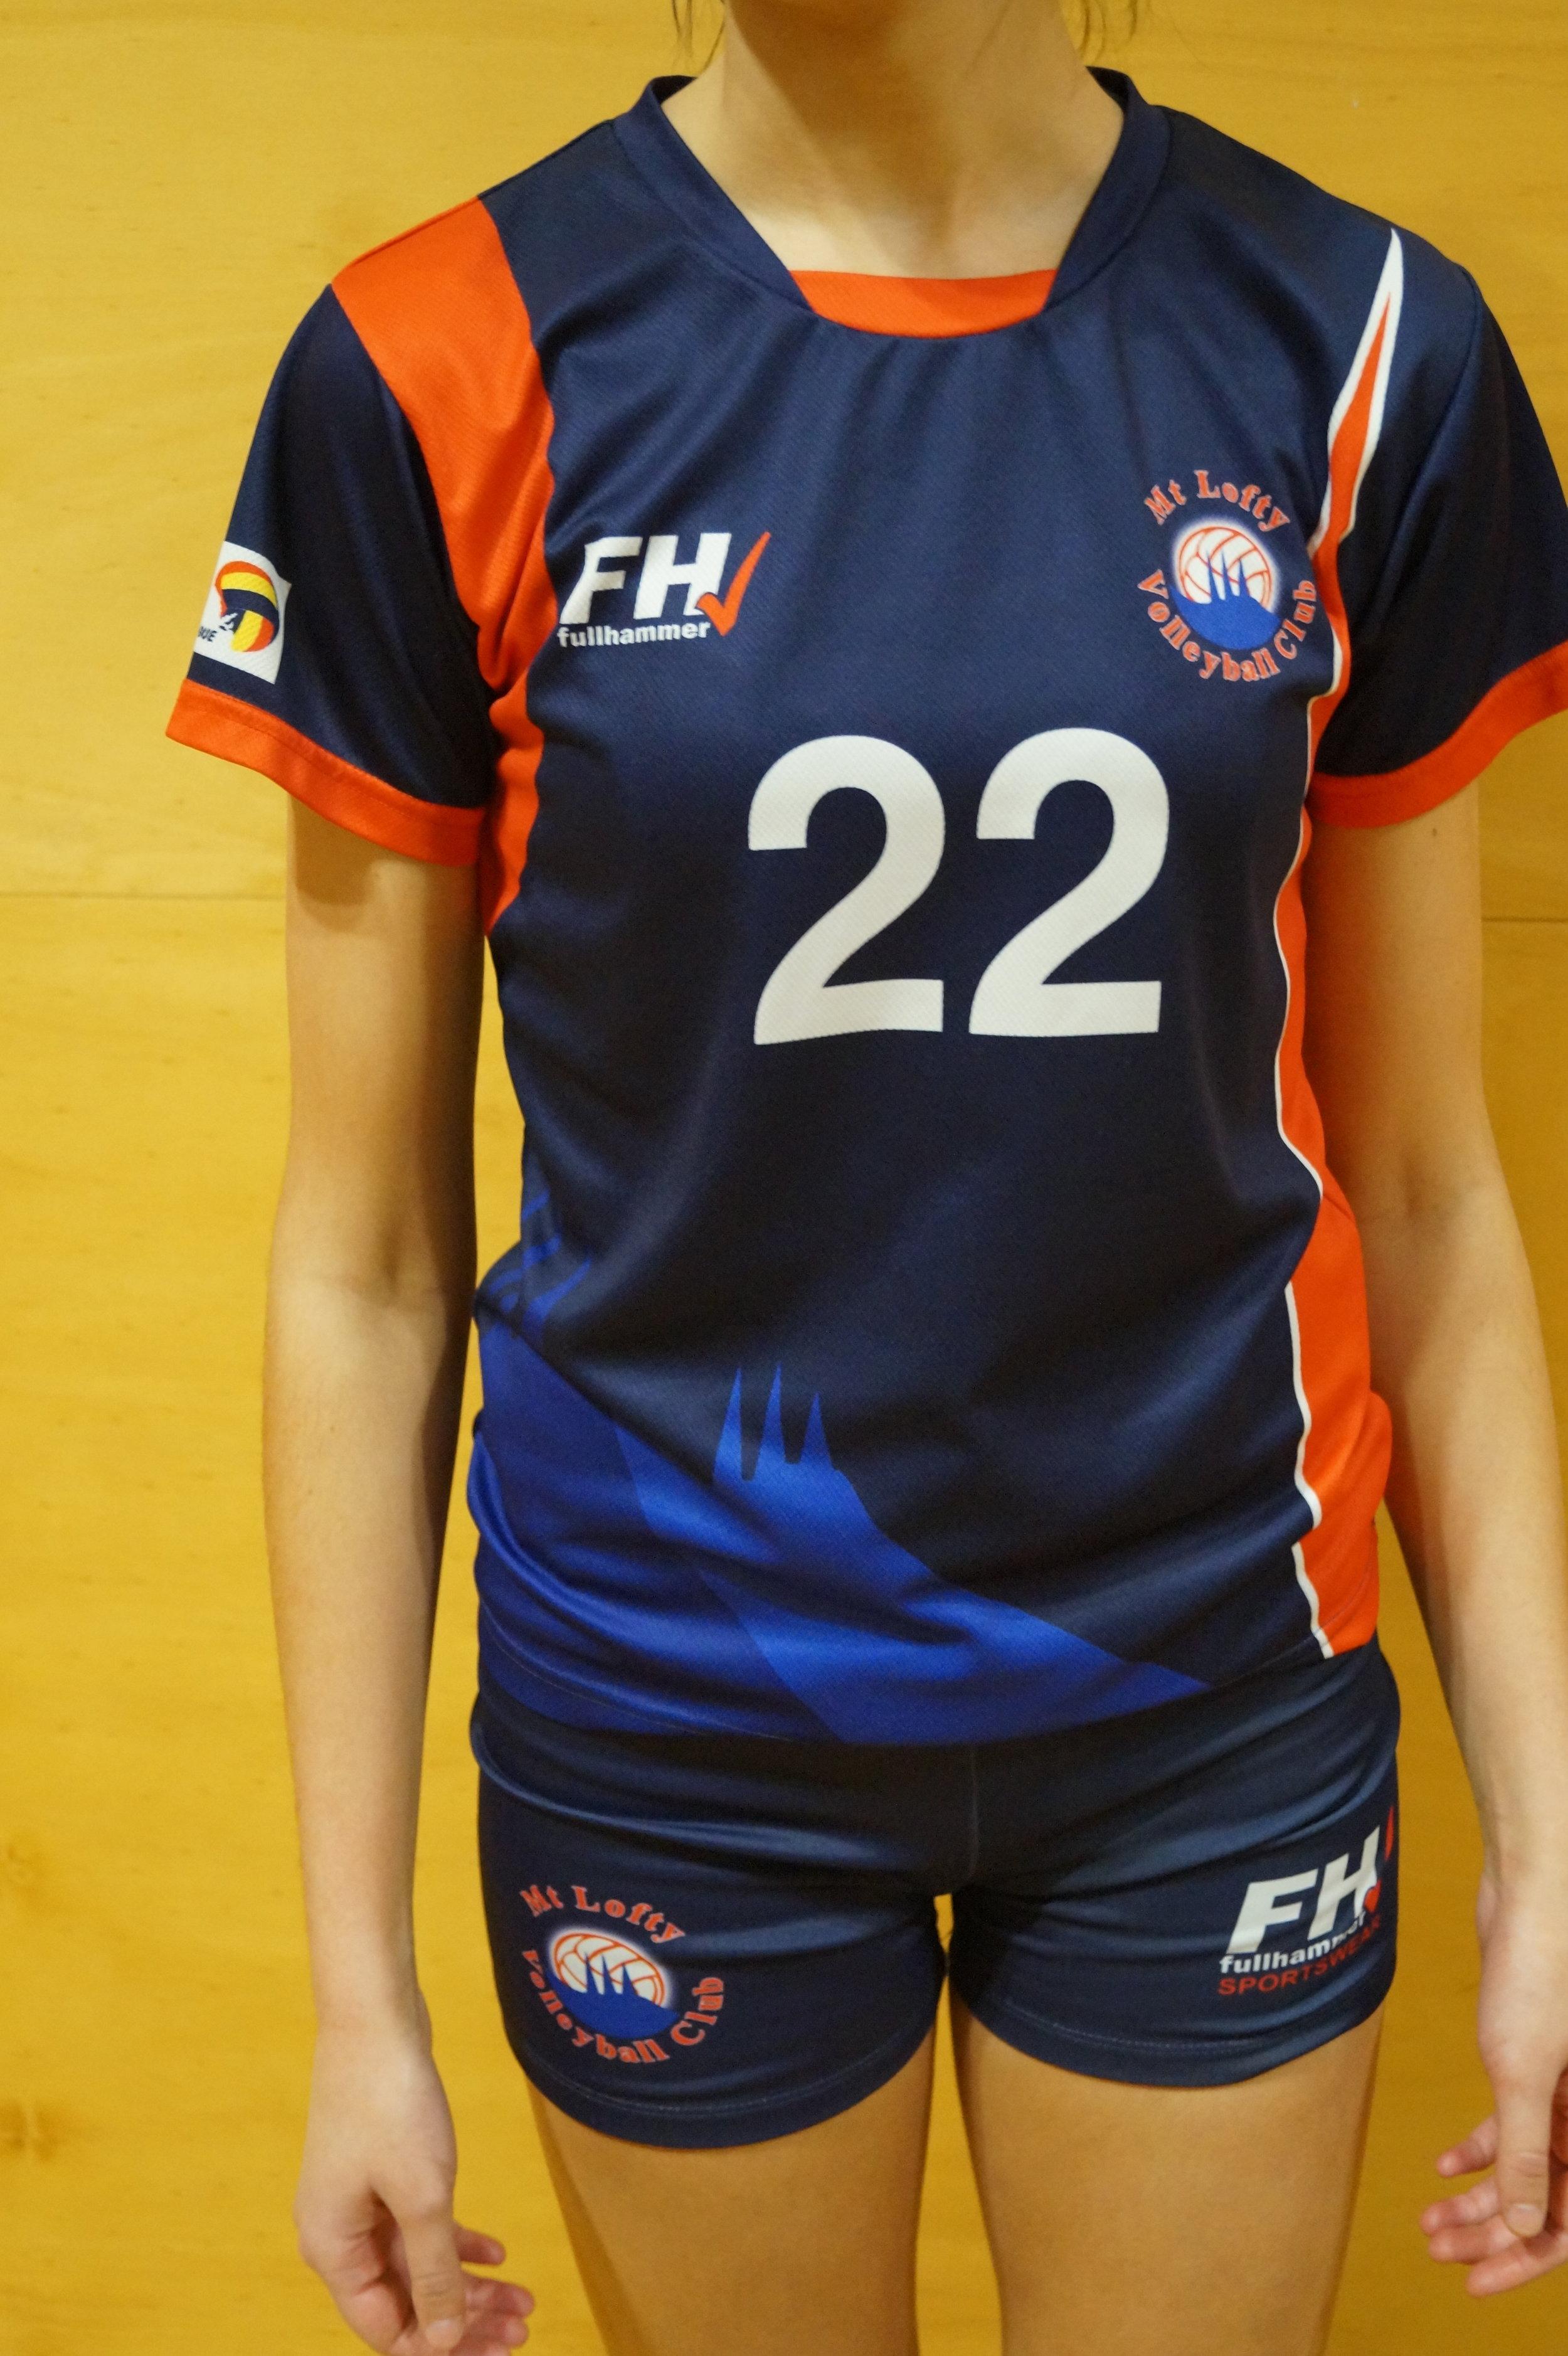 Womens uniform 2.JPG